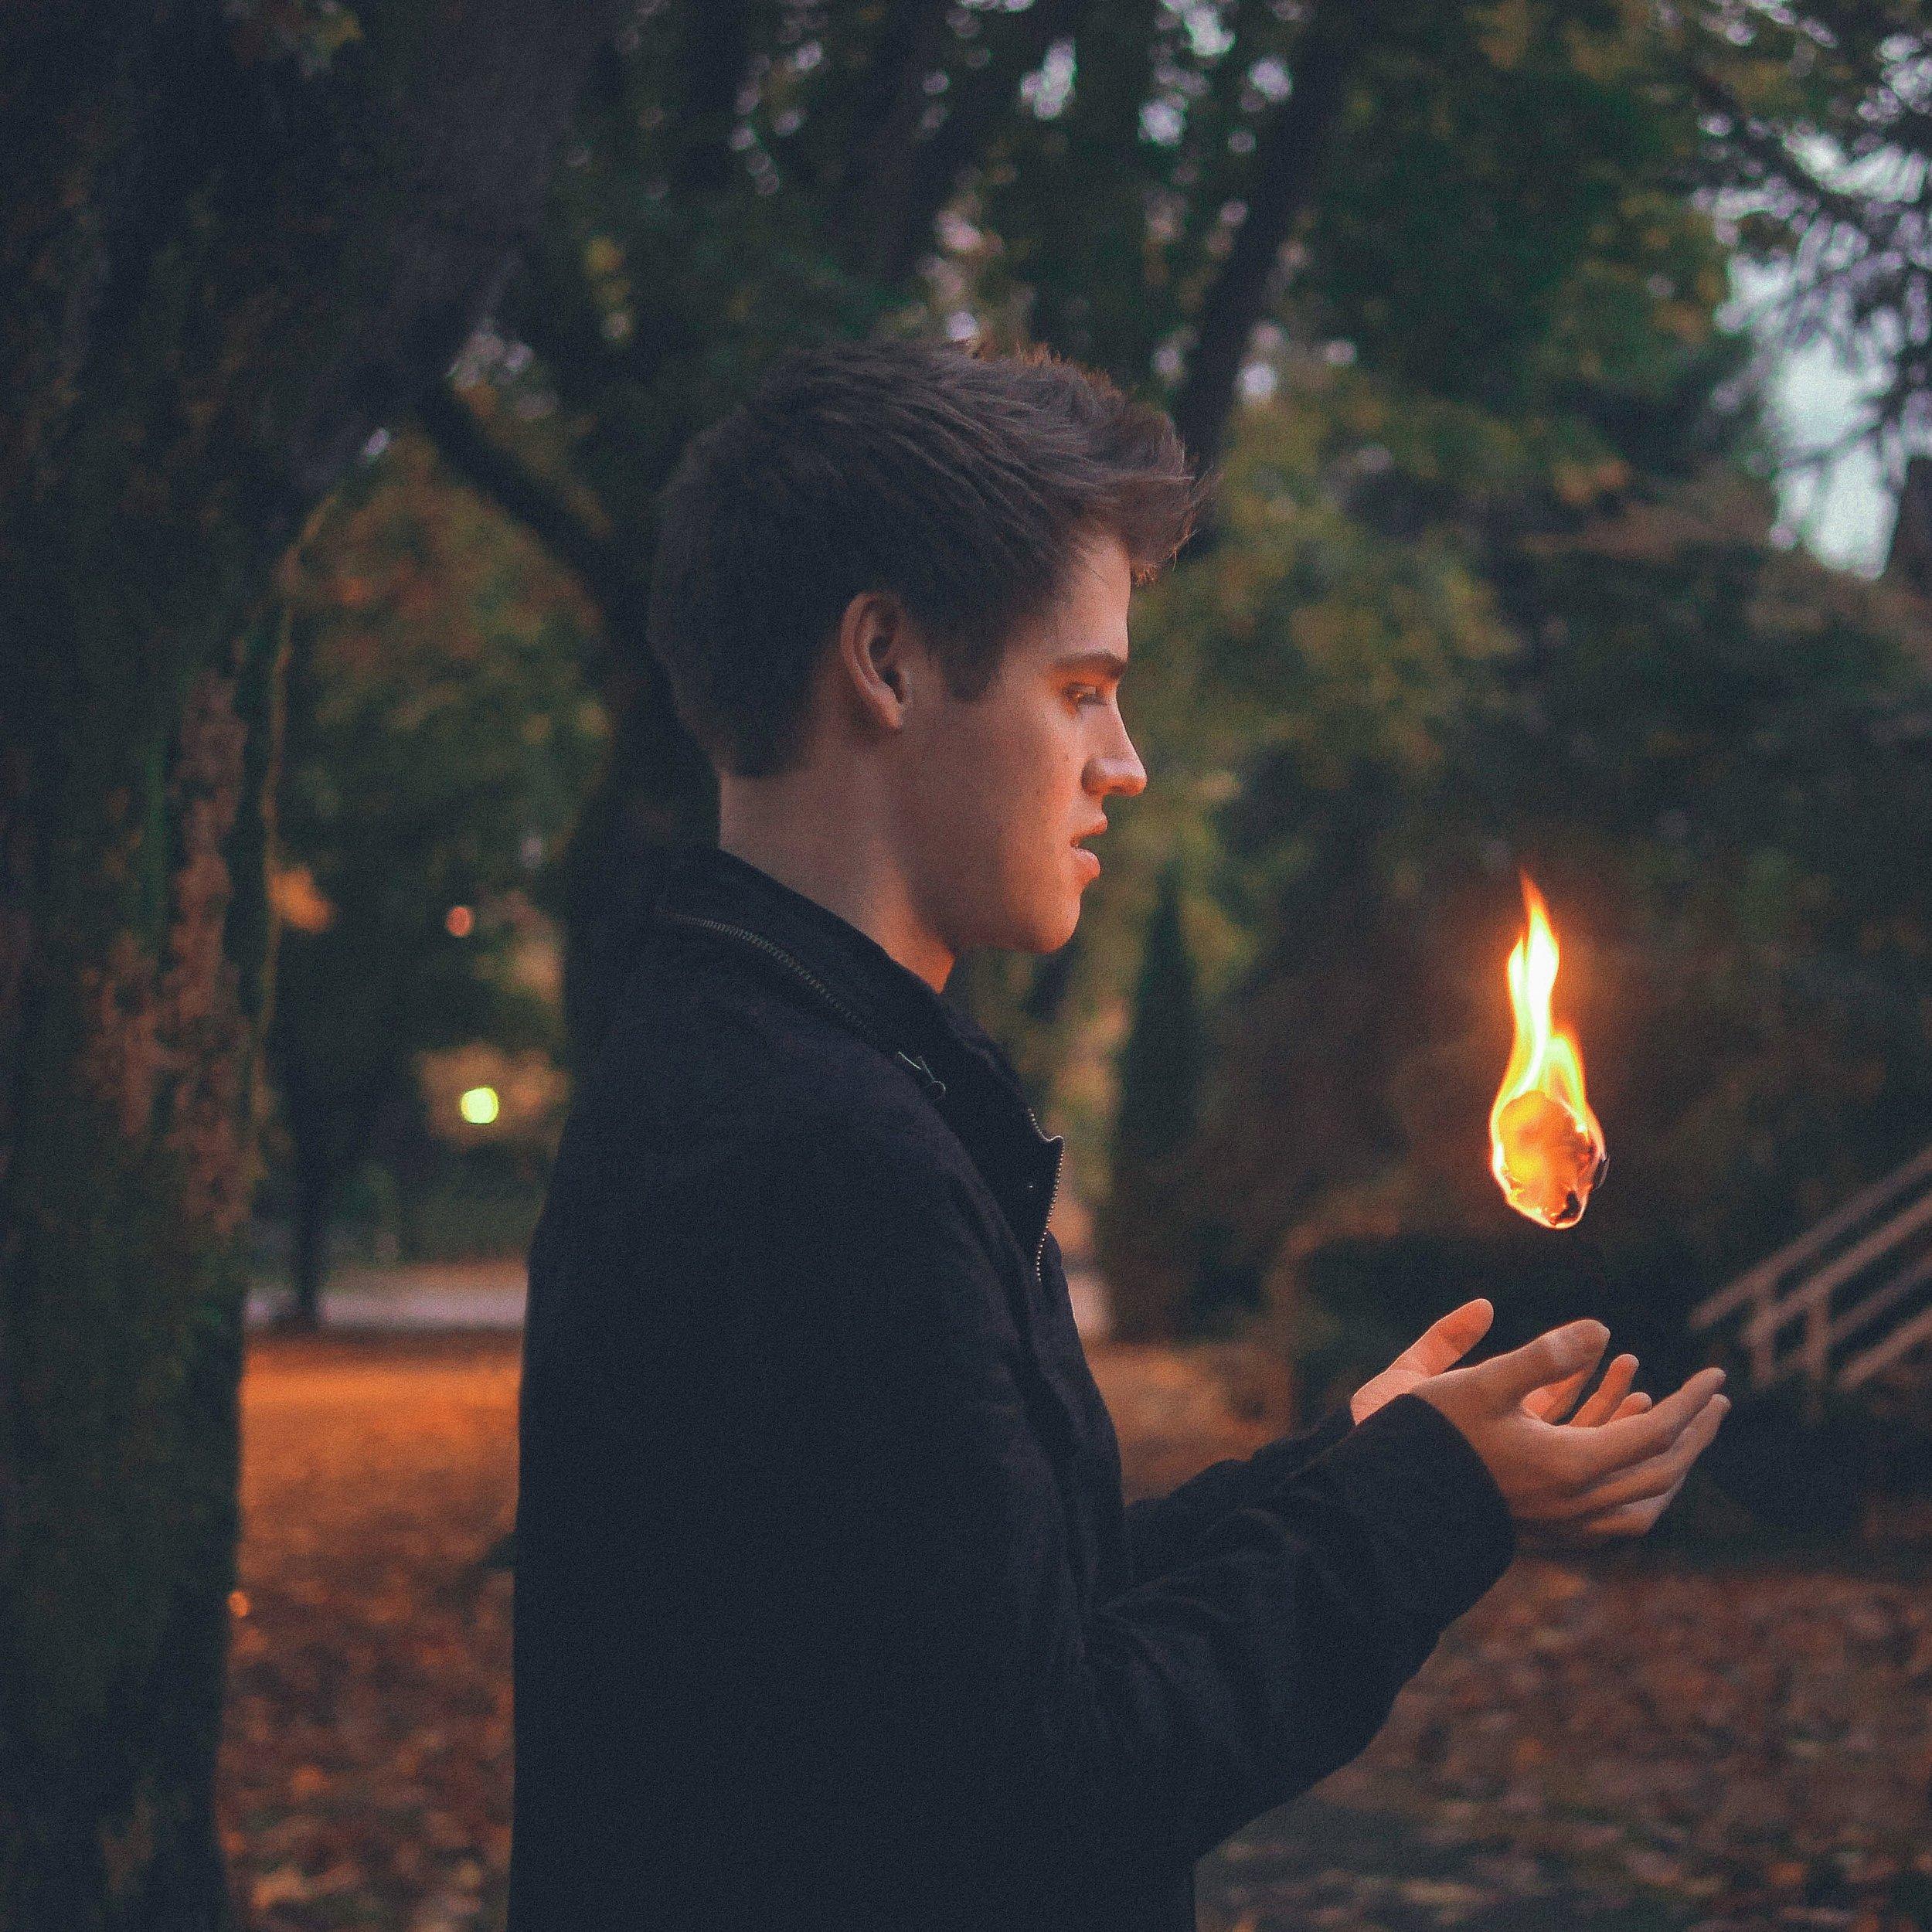 Fall Surrealism Photography